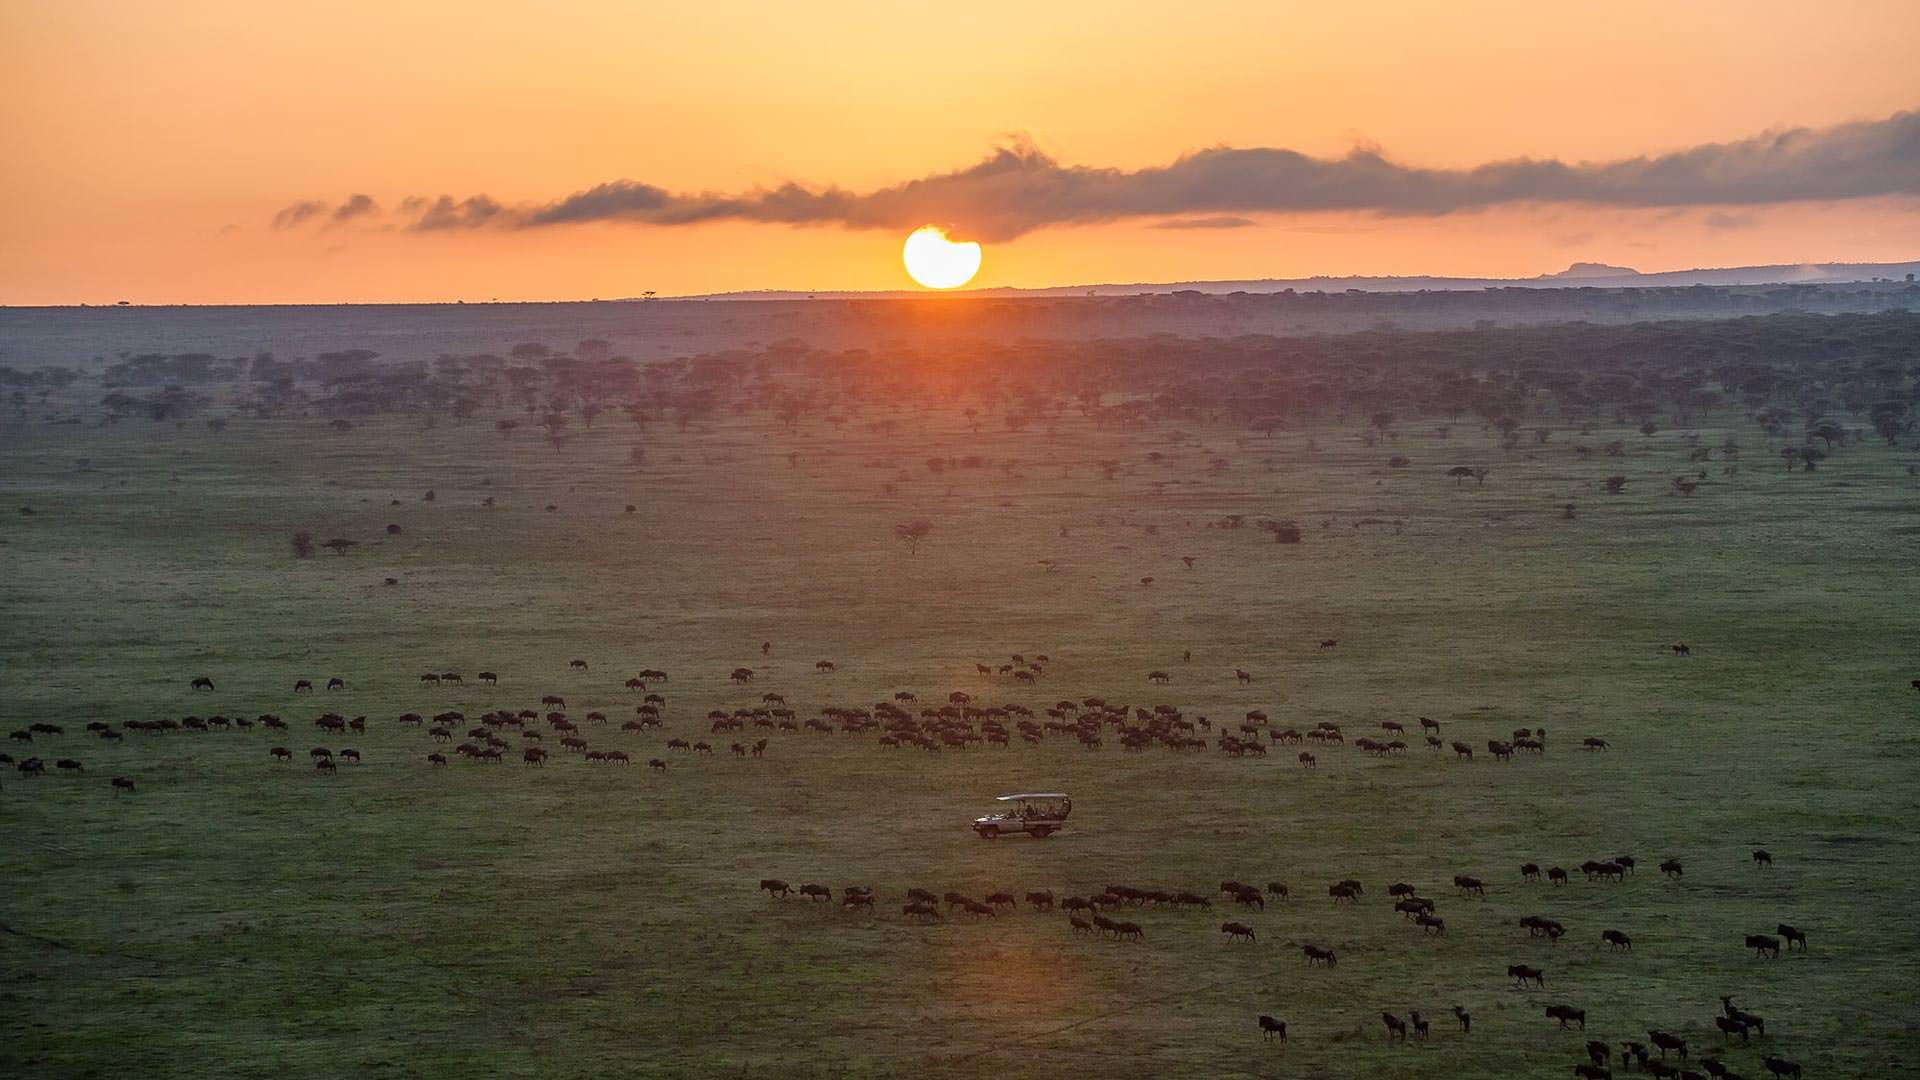 Wildebeest herds in Maswa Game Reserve